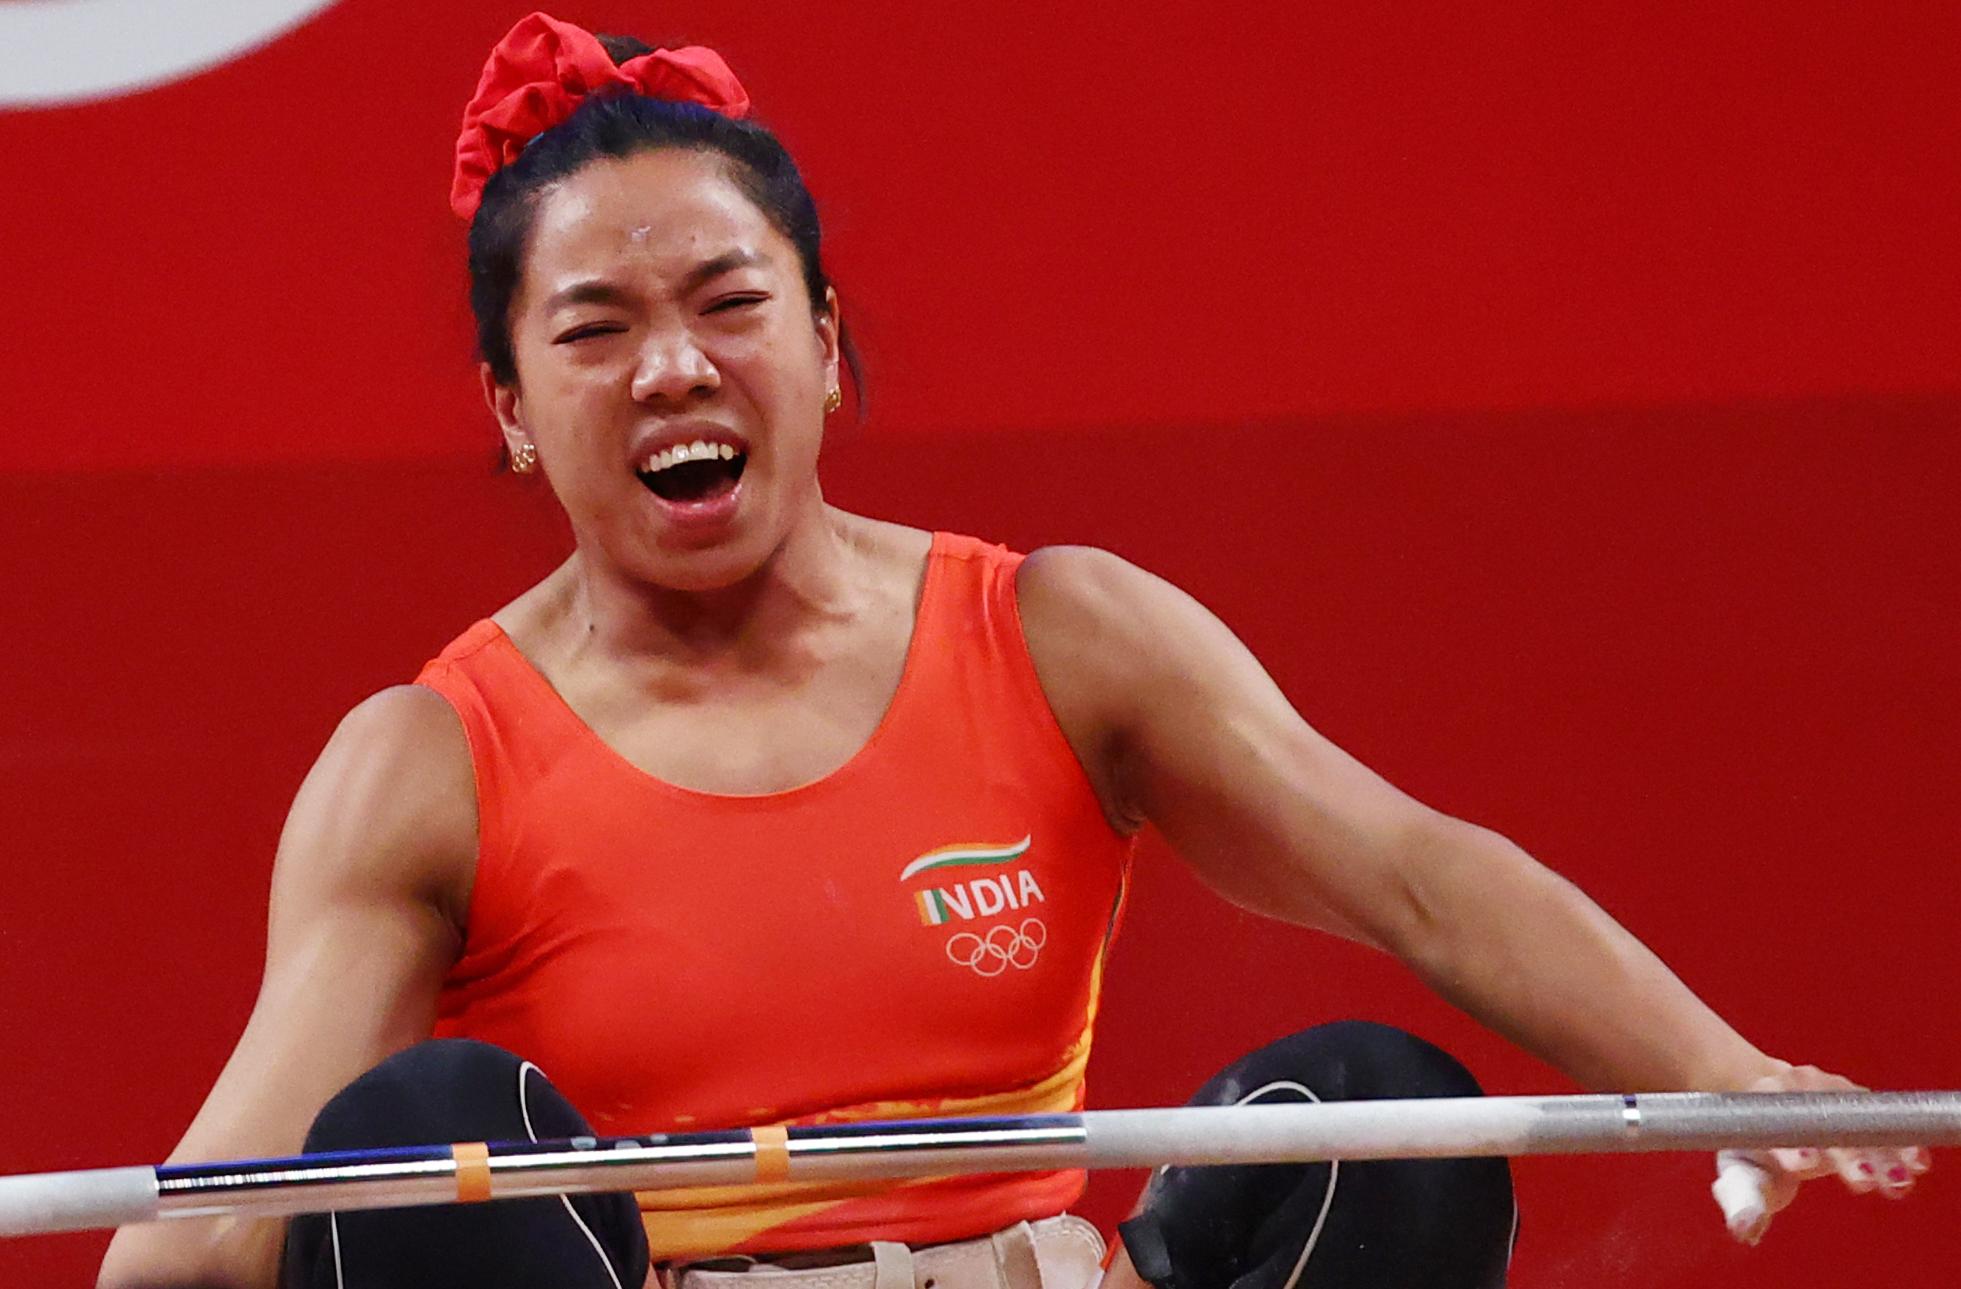 Tokyo 2020 Olympics - Weightlifting - Women's 49kg - Group A - Tokyo International Forum, Tokyo, Japan - July 24, 2021.  Mirabai Chanu Saikhom of India reacts after a lift. REUTERS/Edgard Garrido